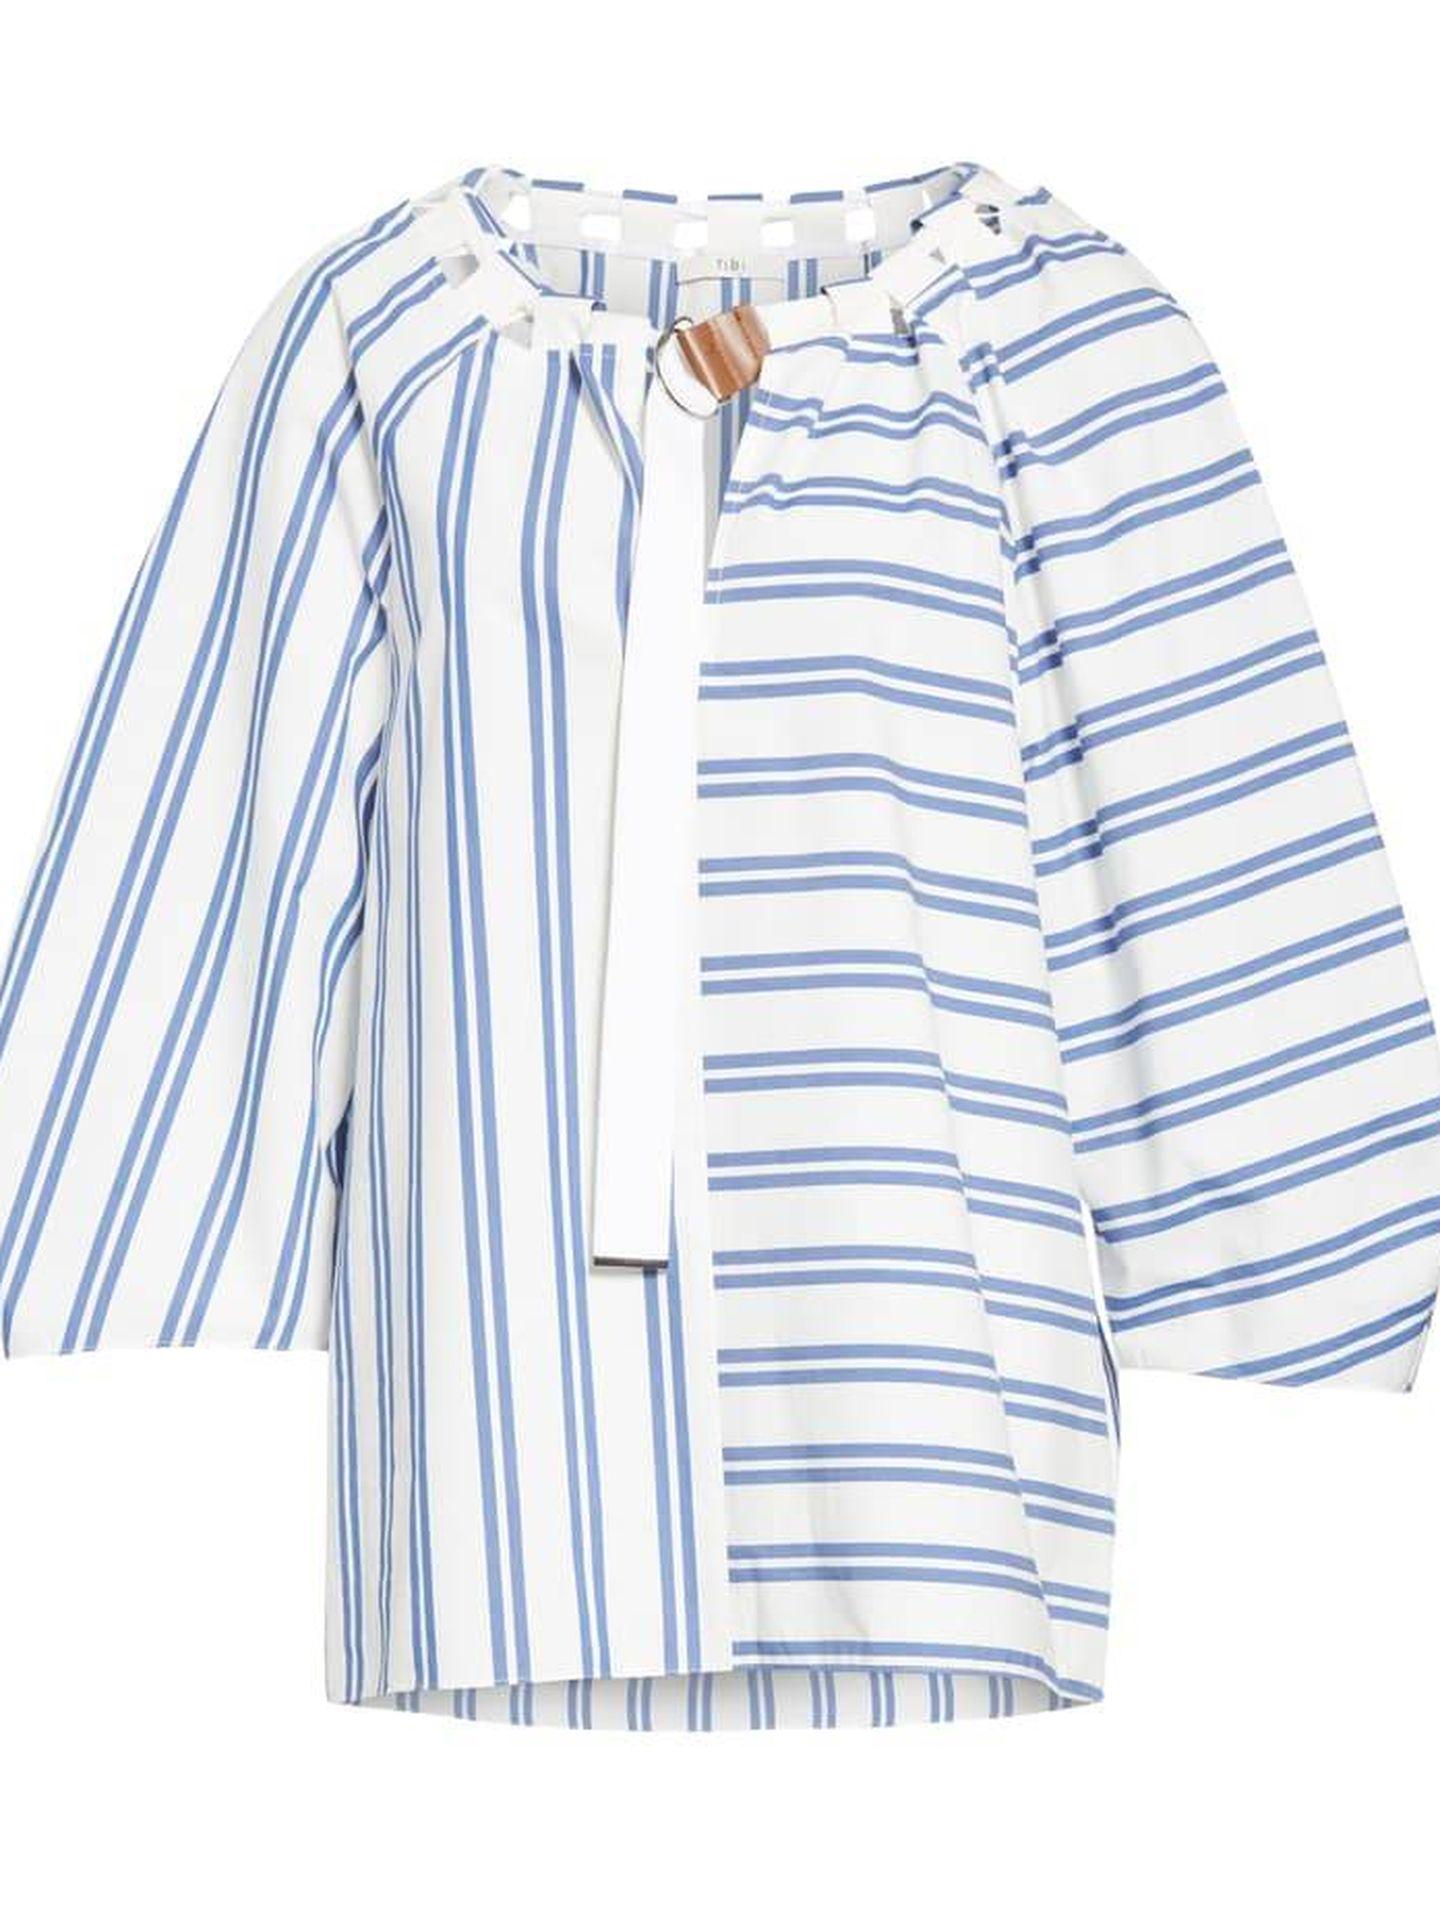 La blusa de Tibi que luce Rania. (Cortesía)